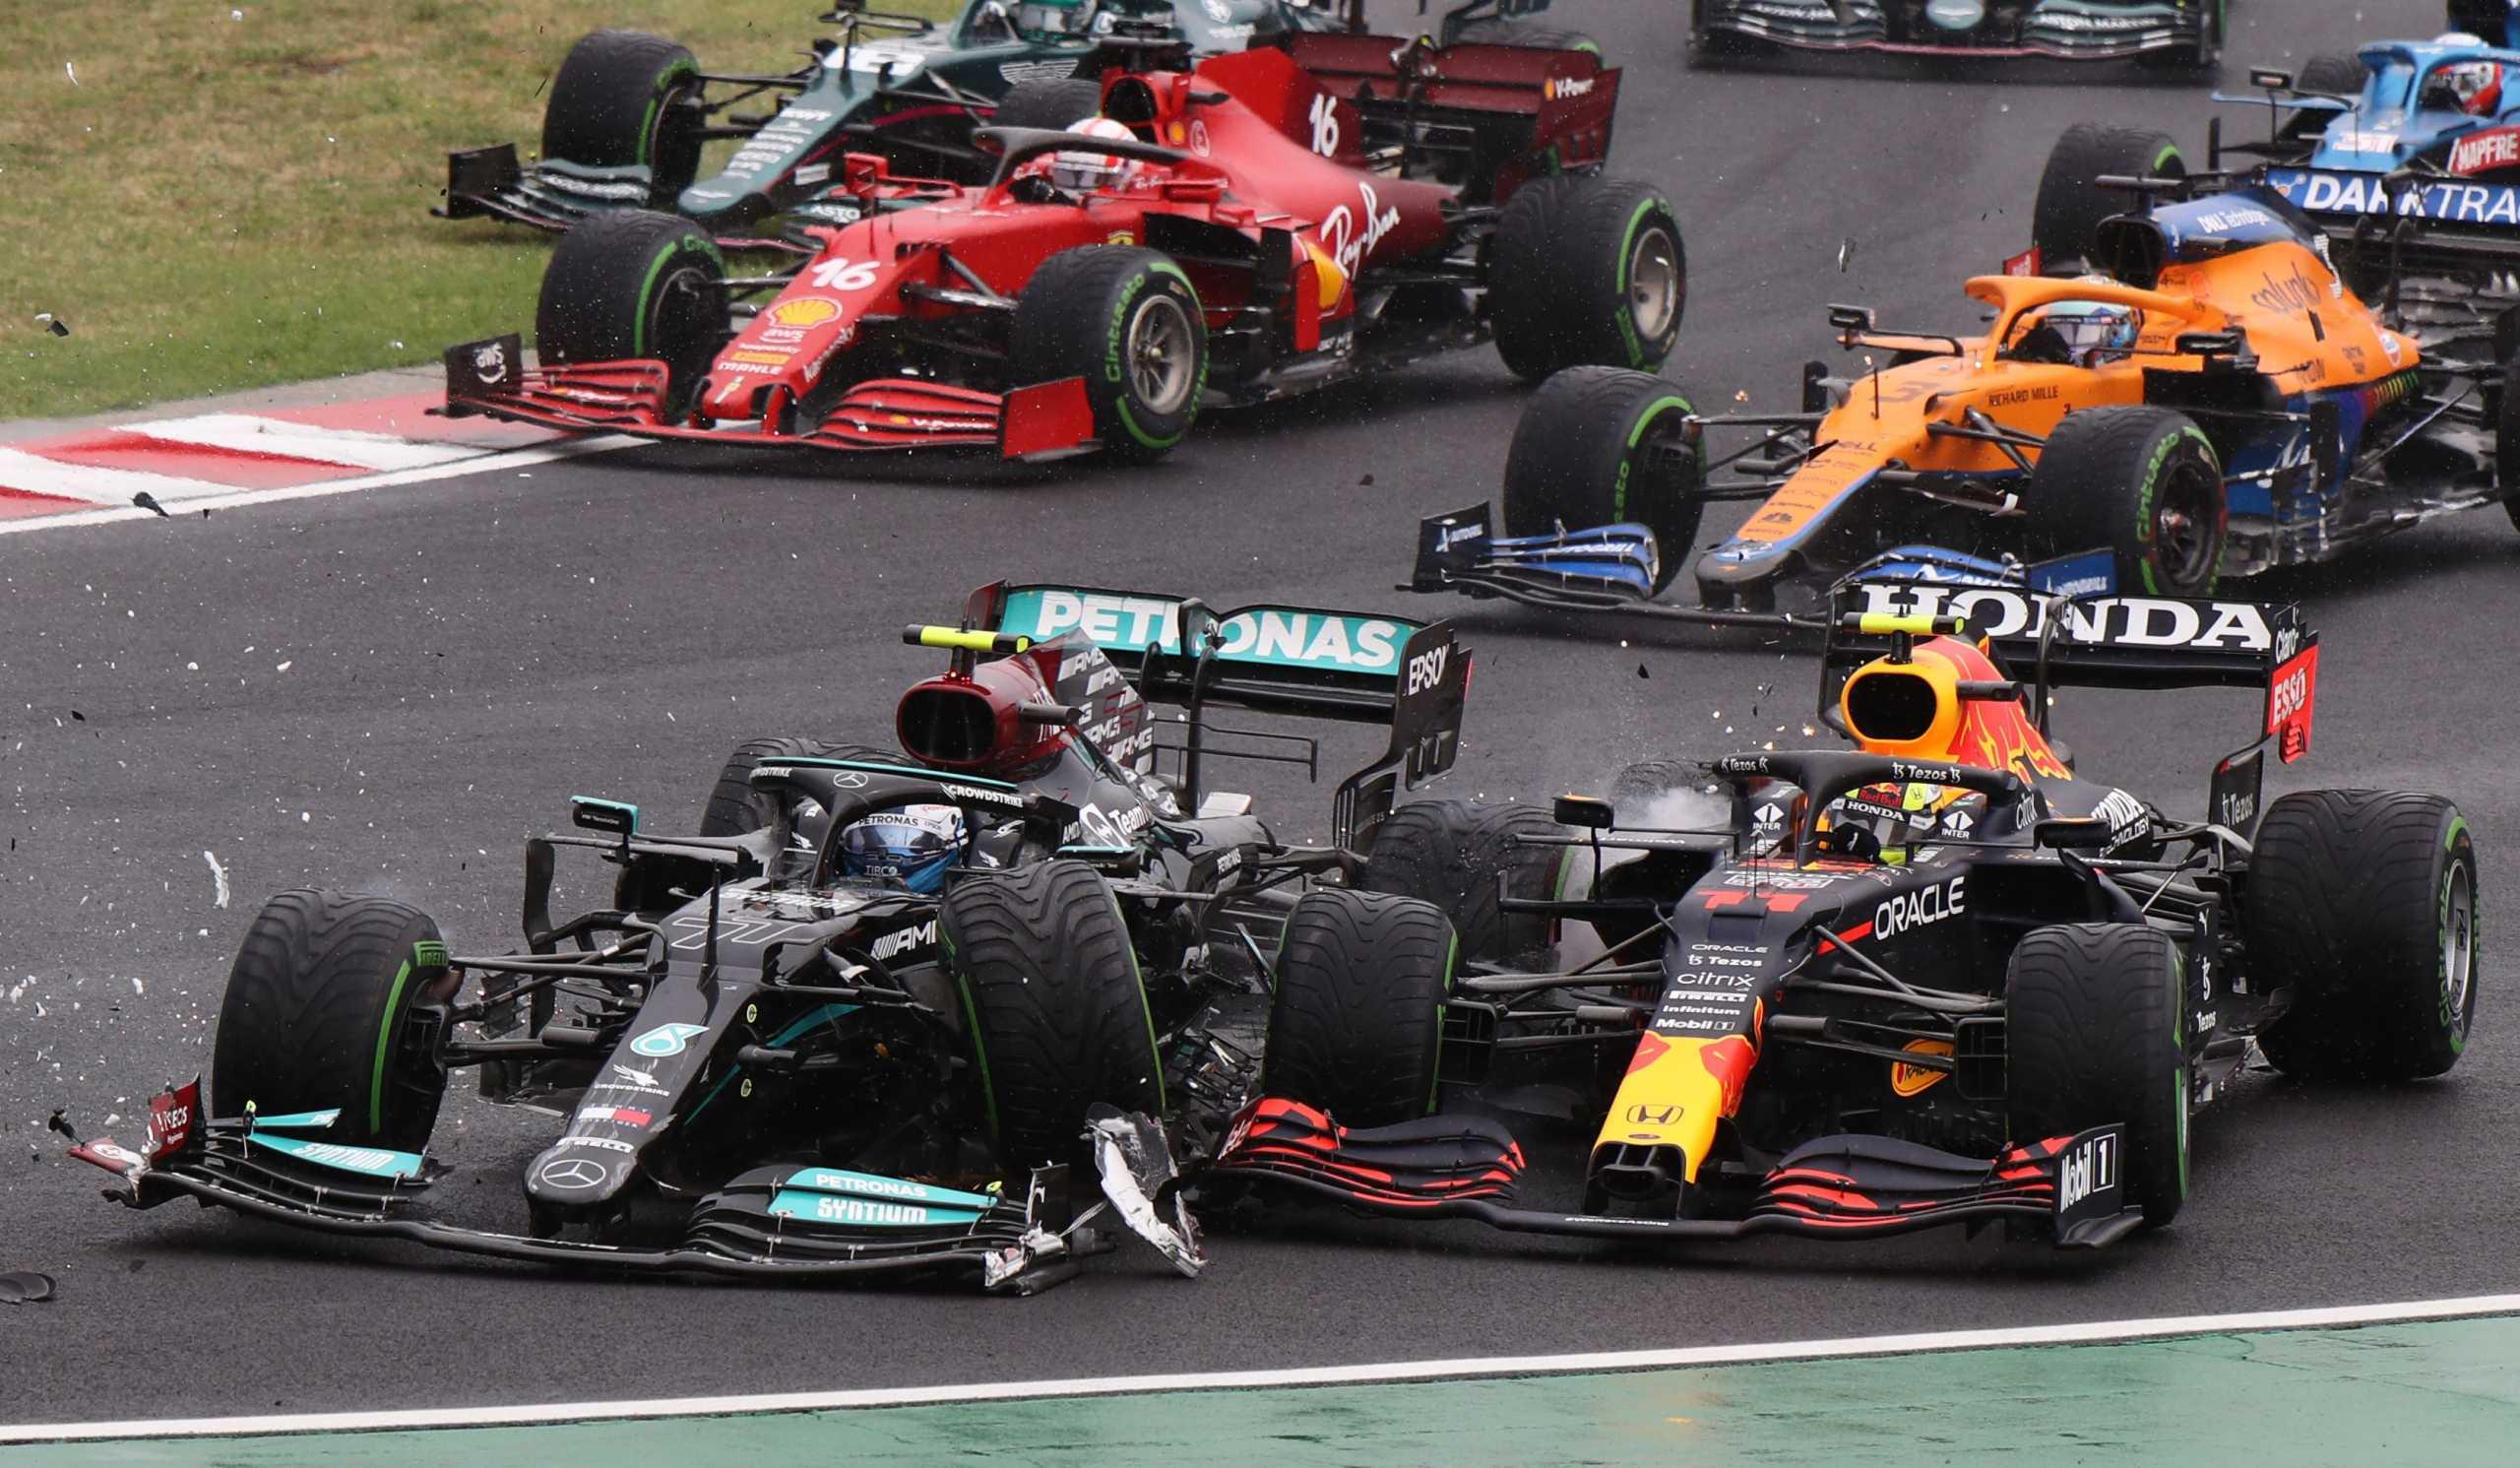 Formula 1: Καραμπόλα μετά την εκκίνηση και τέσσερα μονοθέσια εκτός Grand Prix στην Ουγγαρία